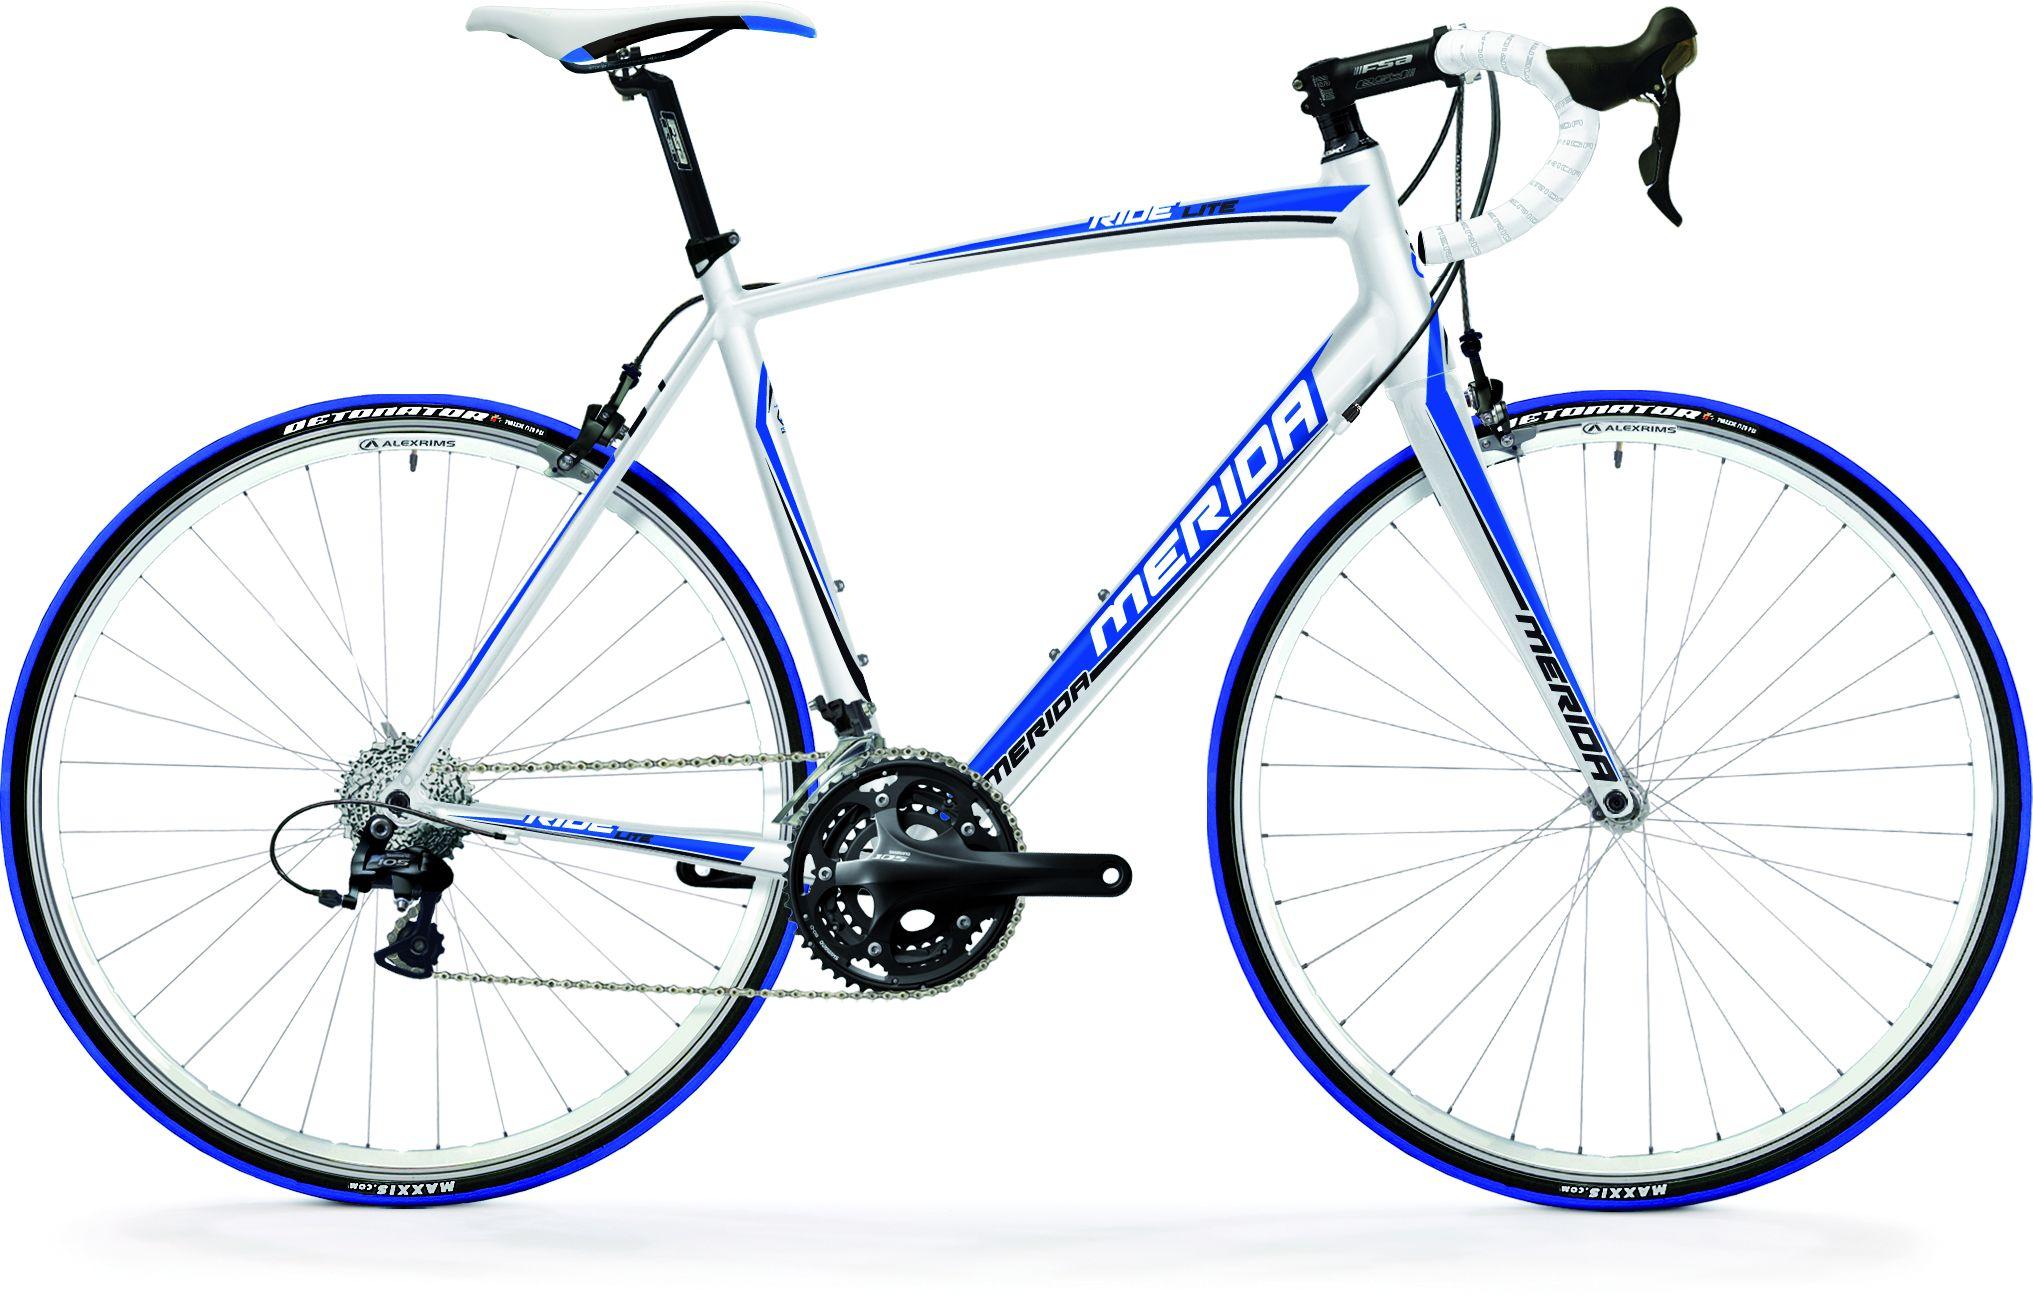 Ride Lite 94 30 2011